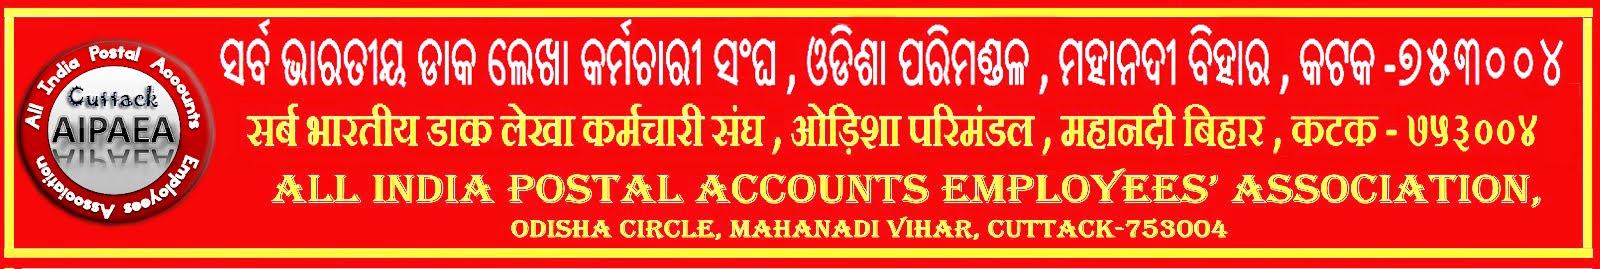 ||* ALL INDIA POSTAL ACCOUNTS EMPLOYEES ASSOCIATION , ODISHA CIRCLE CUTTACK *||